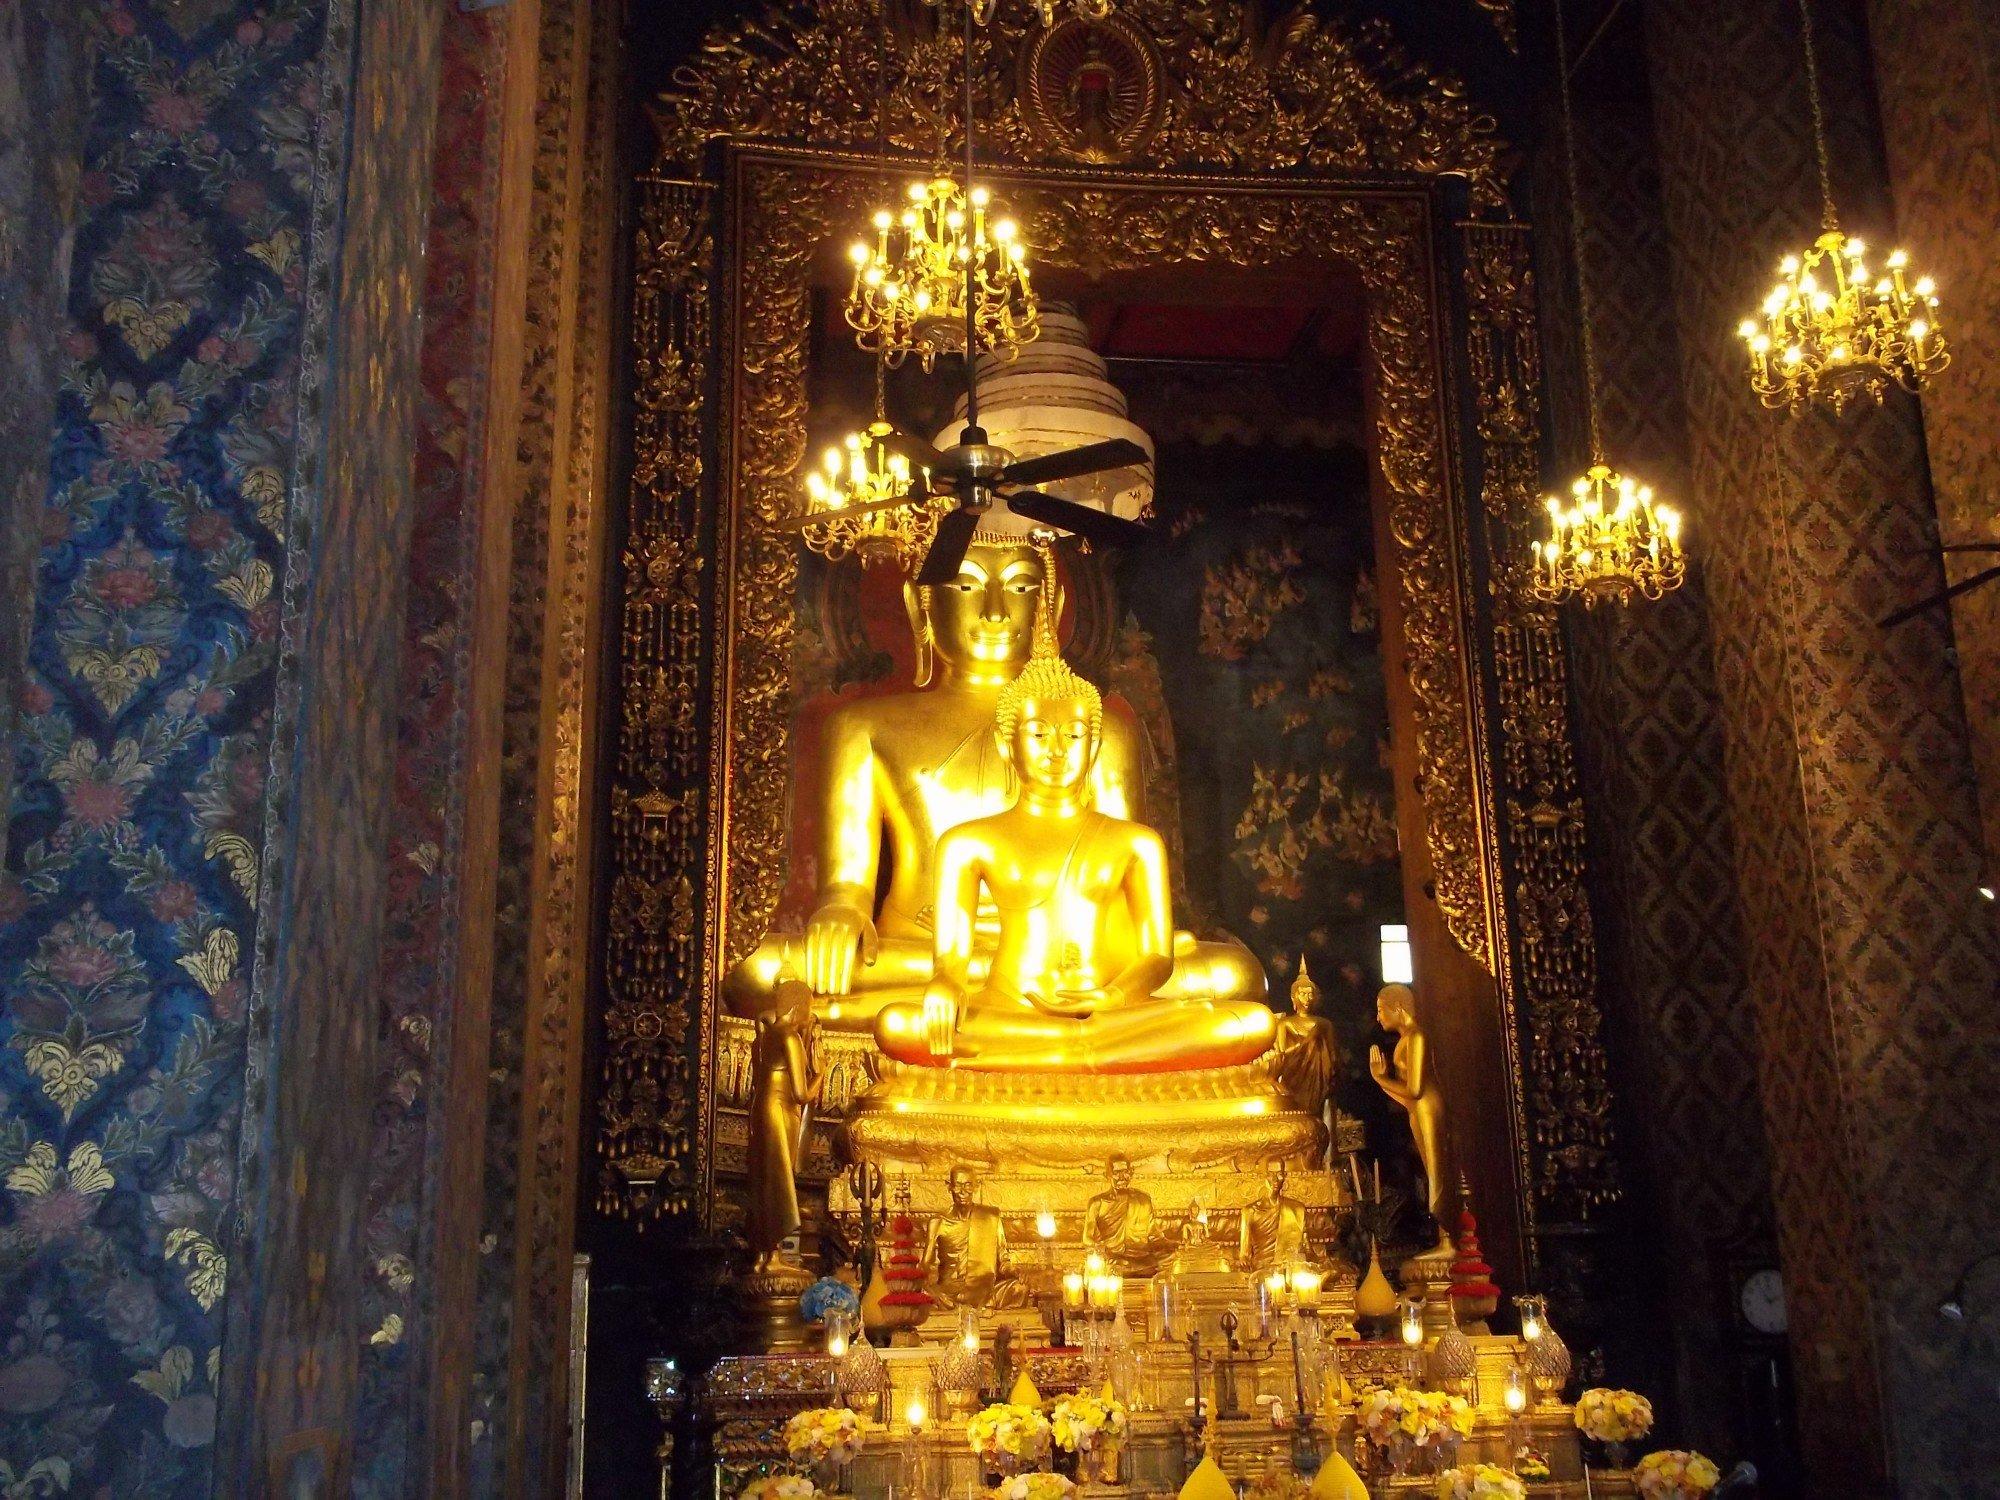 Phra Phuttha Chinasi statue at Wat Bowonniwet